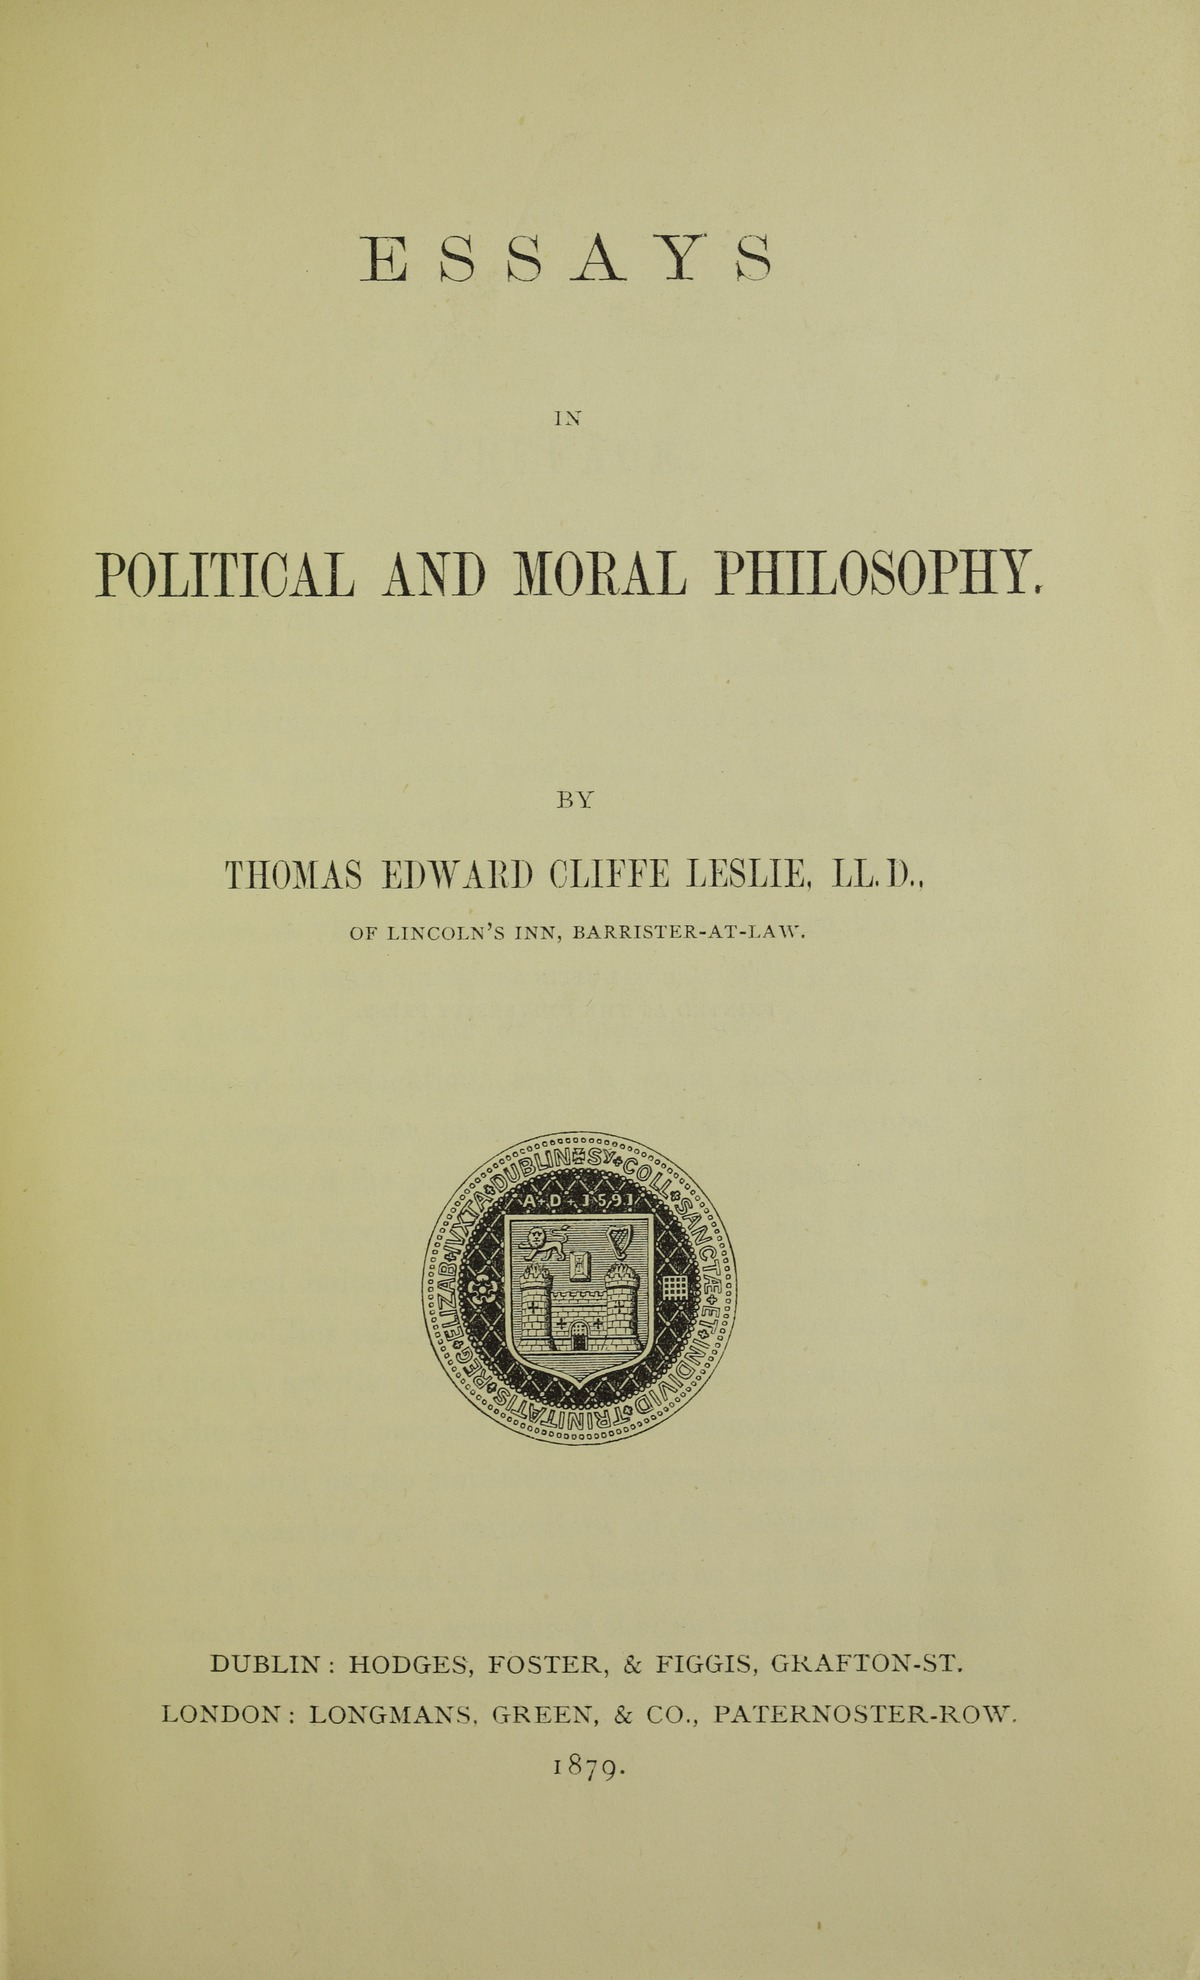 Essay moral philosopher political